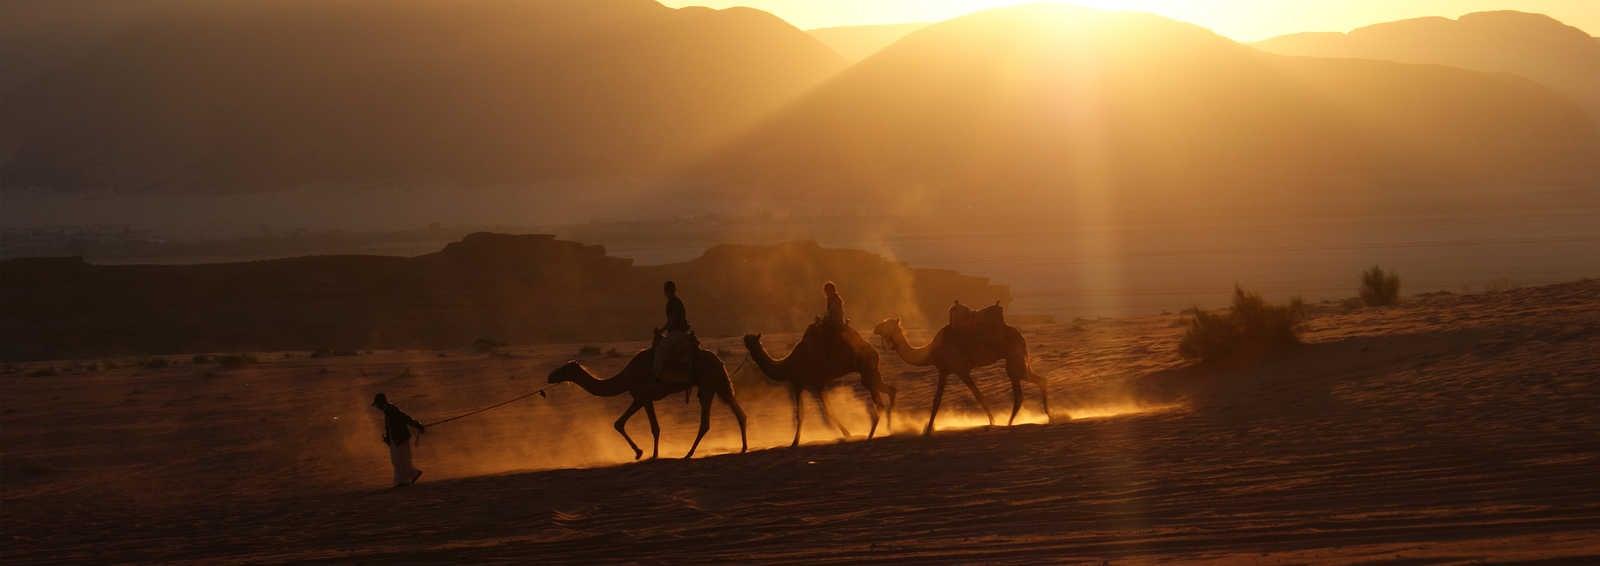 Sunrise in the Wadi Rum, Jordan